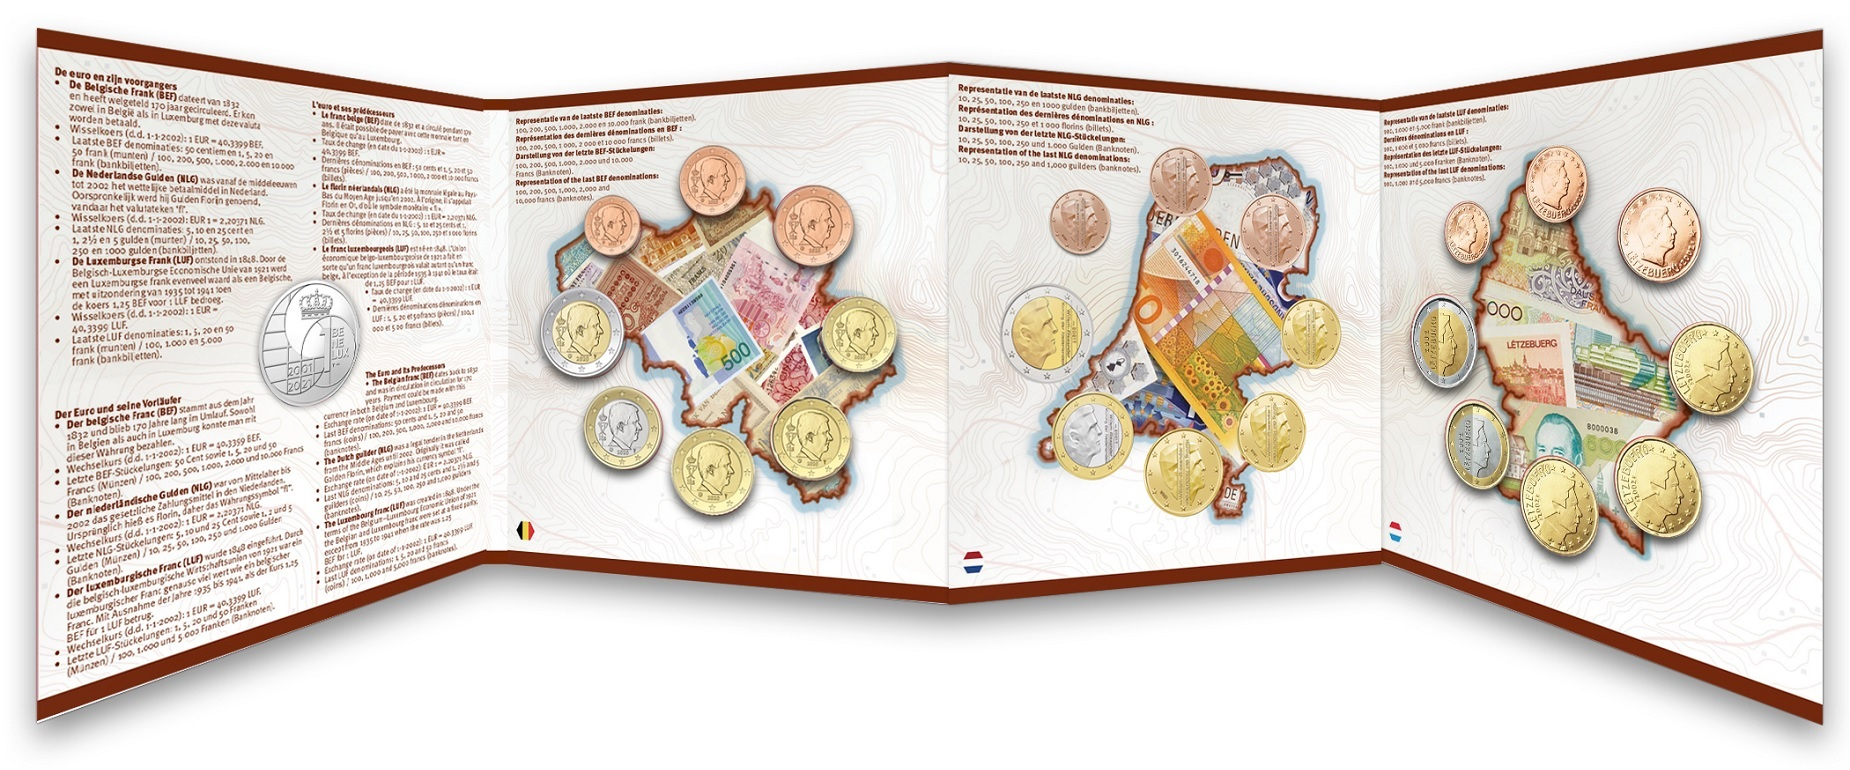 (EUR23.BU.set.2021.0110786) BU coin set Benelux 2021 (inside) (zoom)